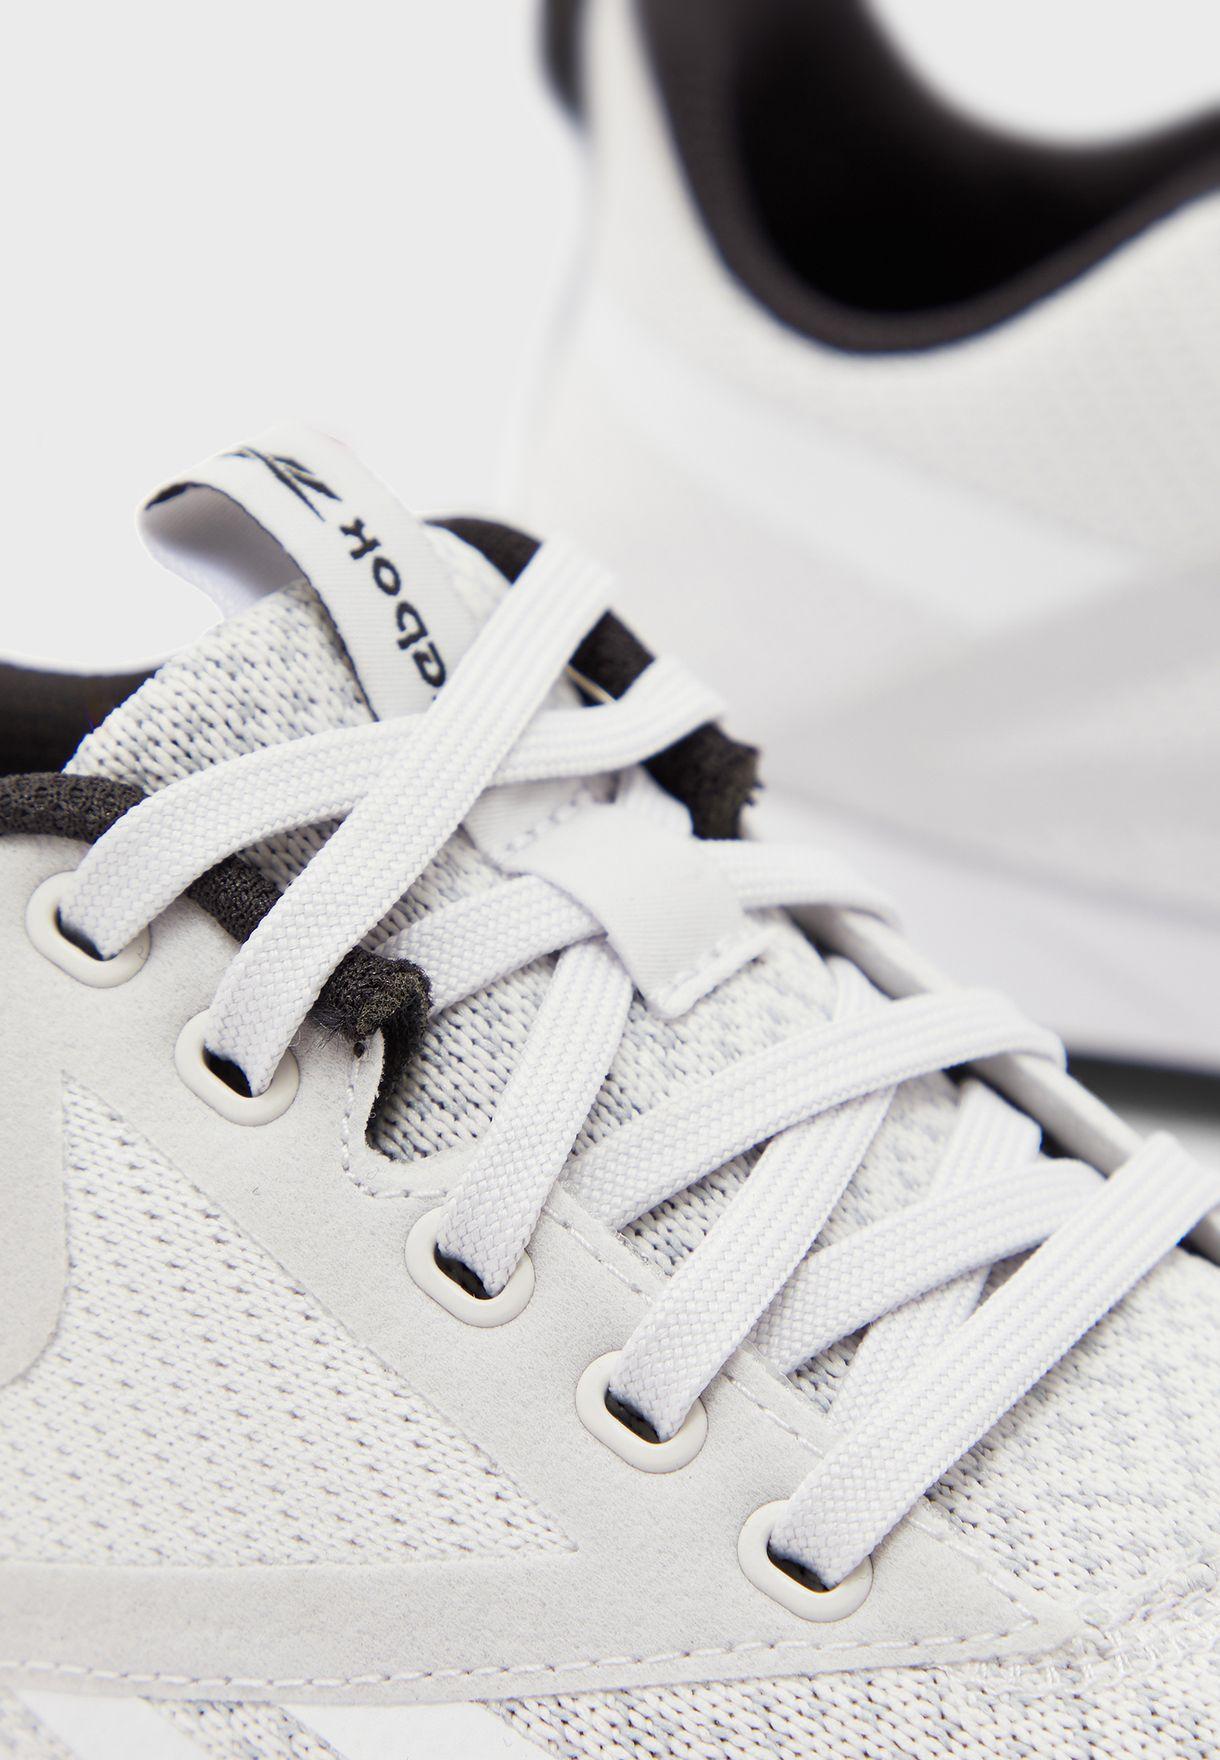 حذاء ايفر رود دي ام